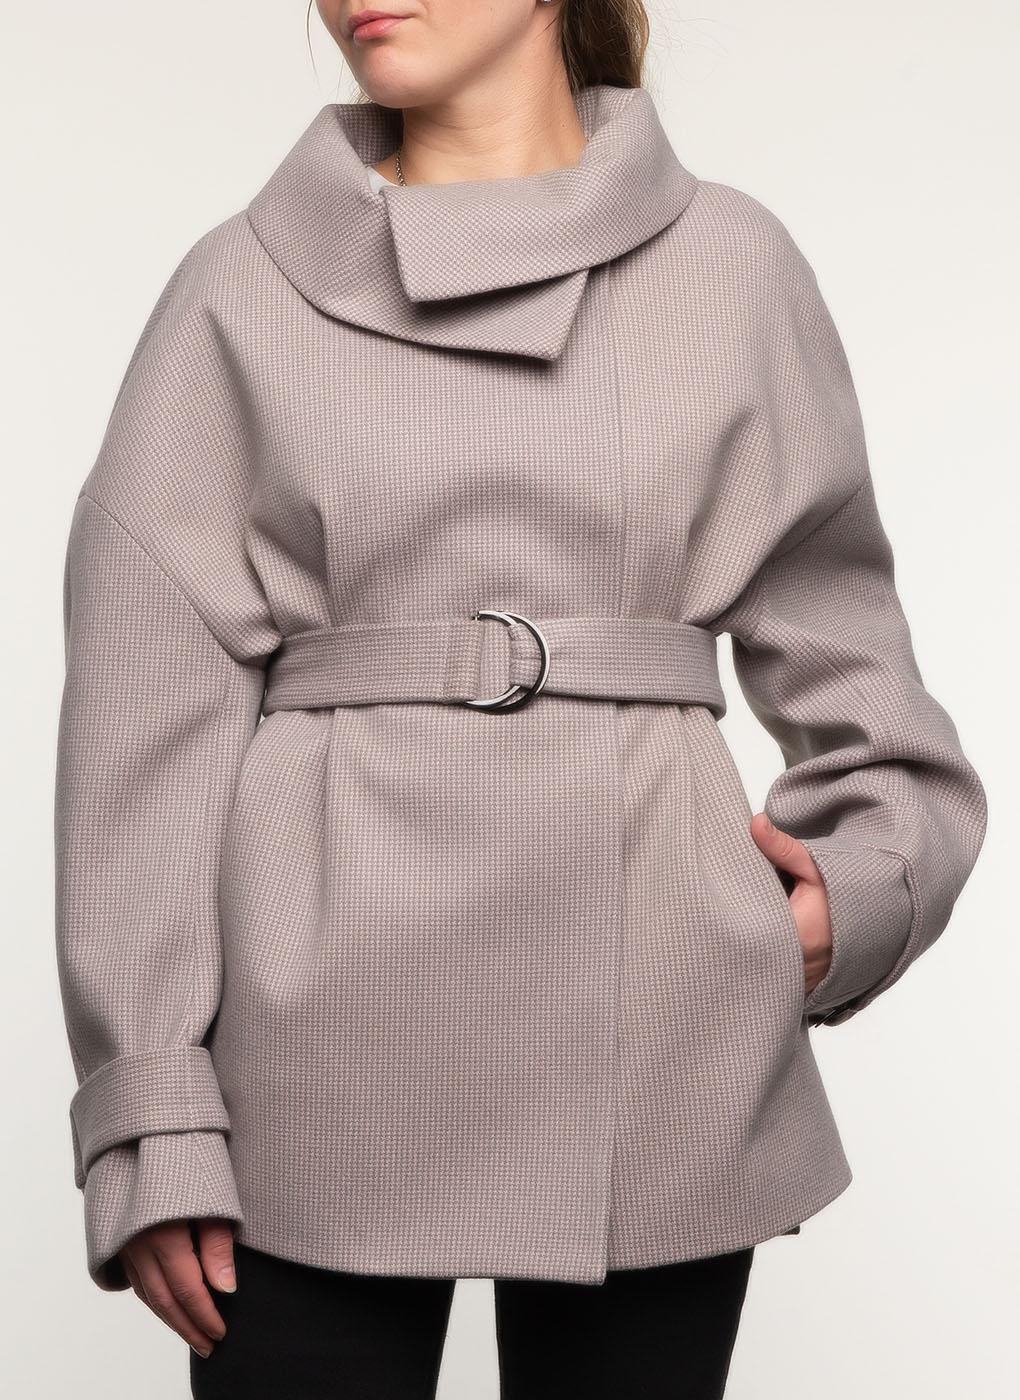 Пальто полушерстяное 112, idekka фото